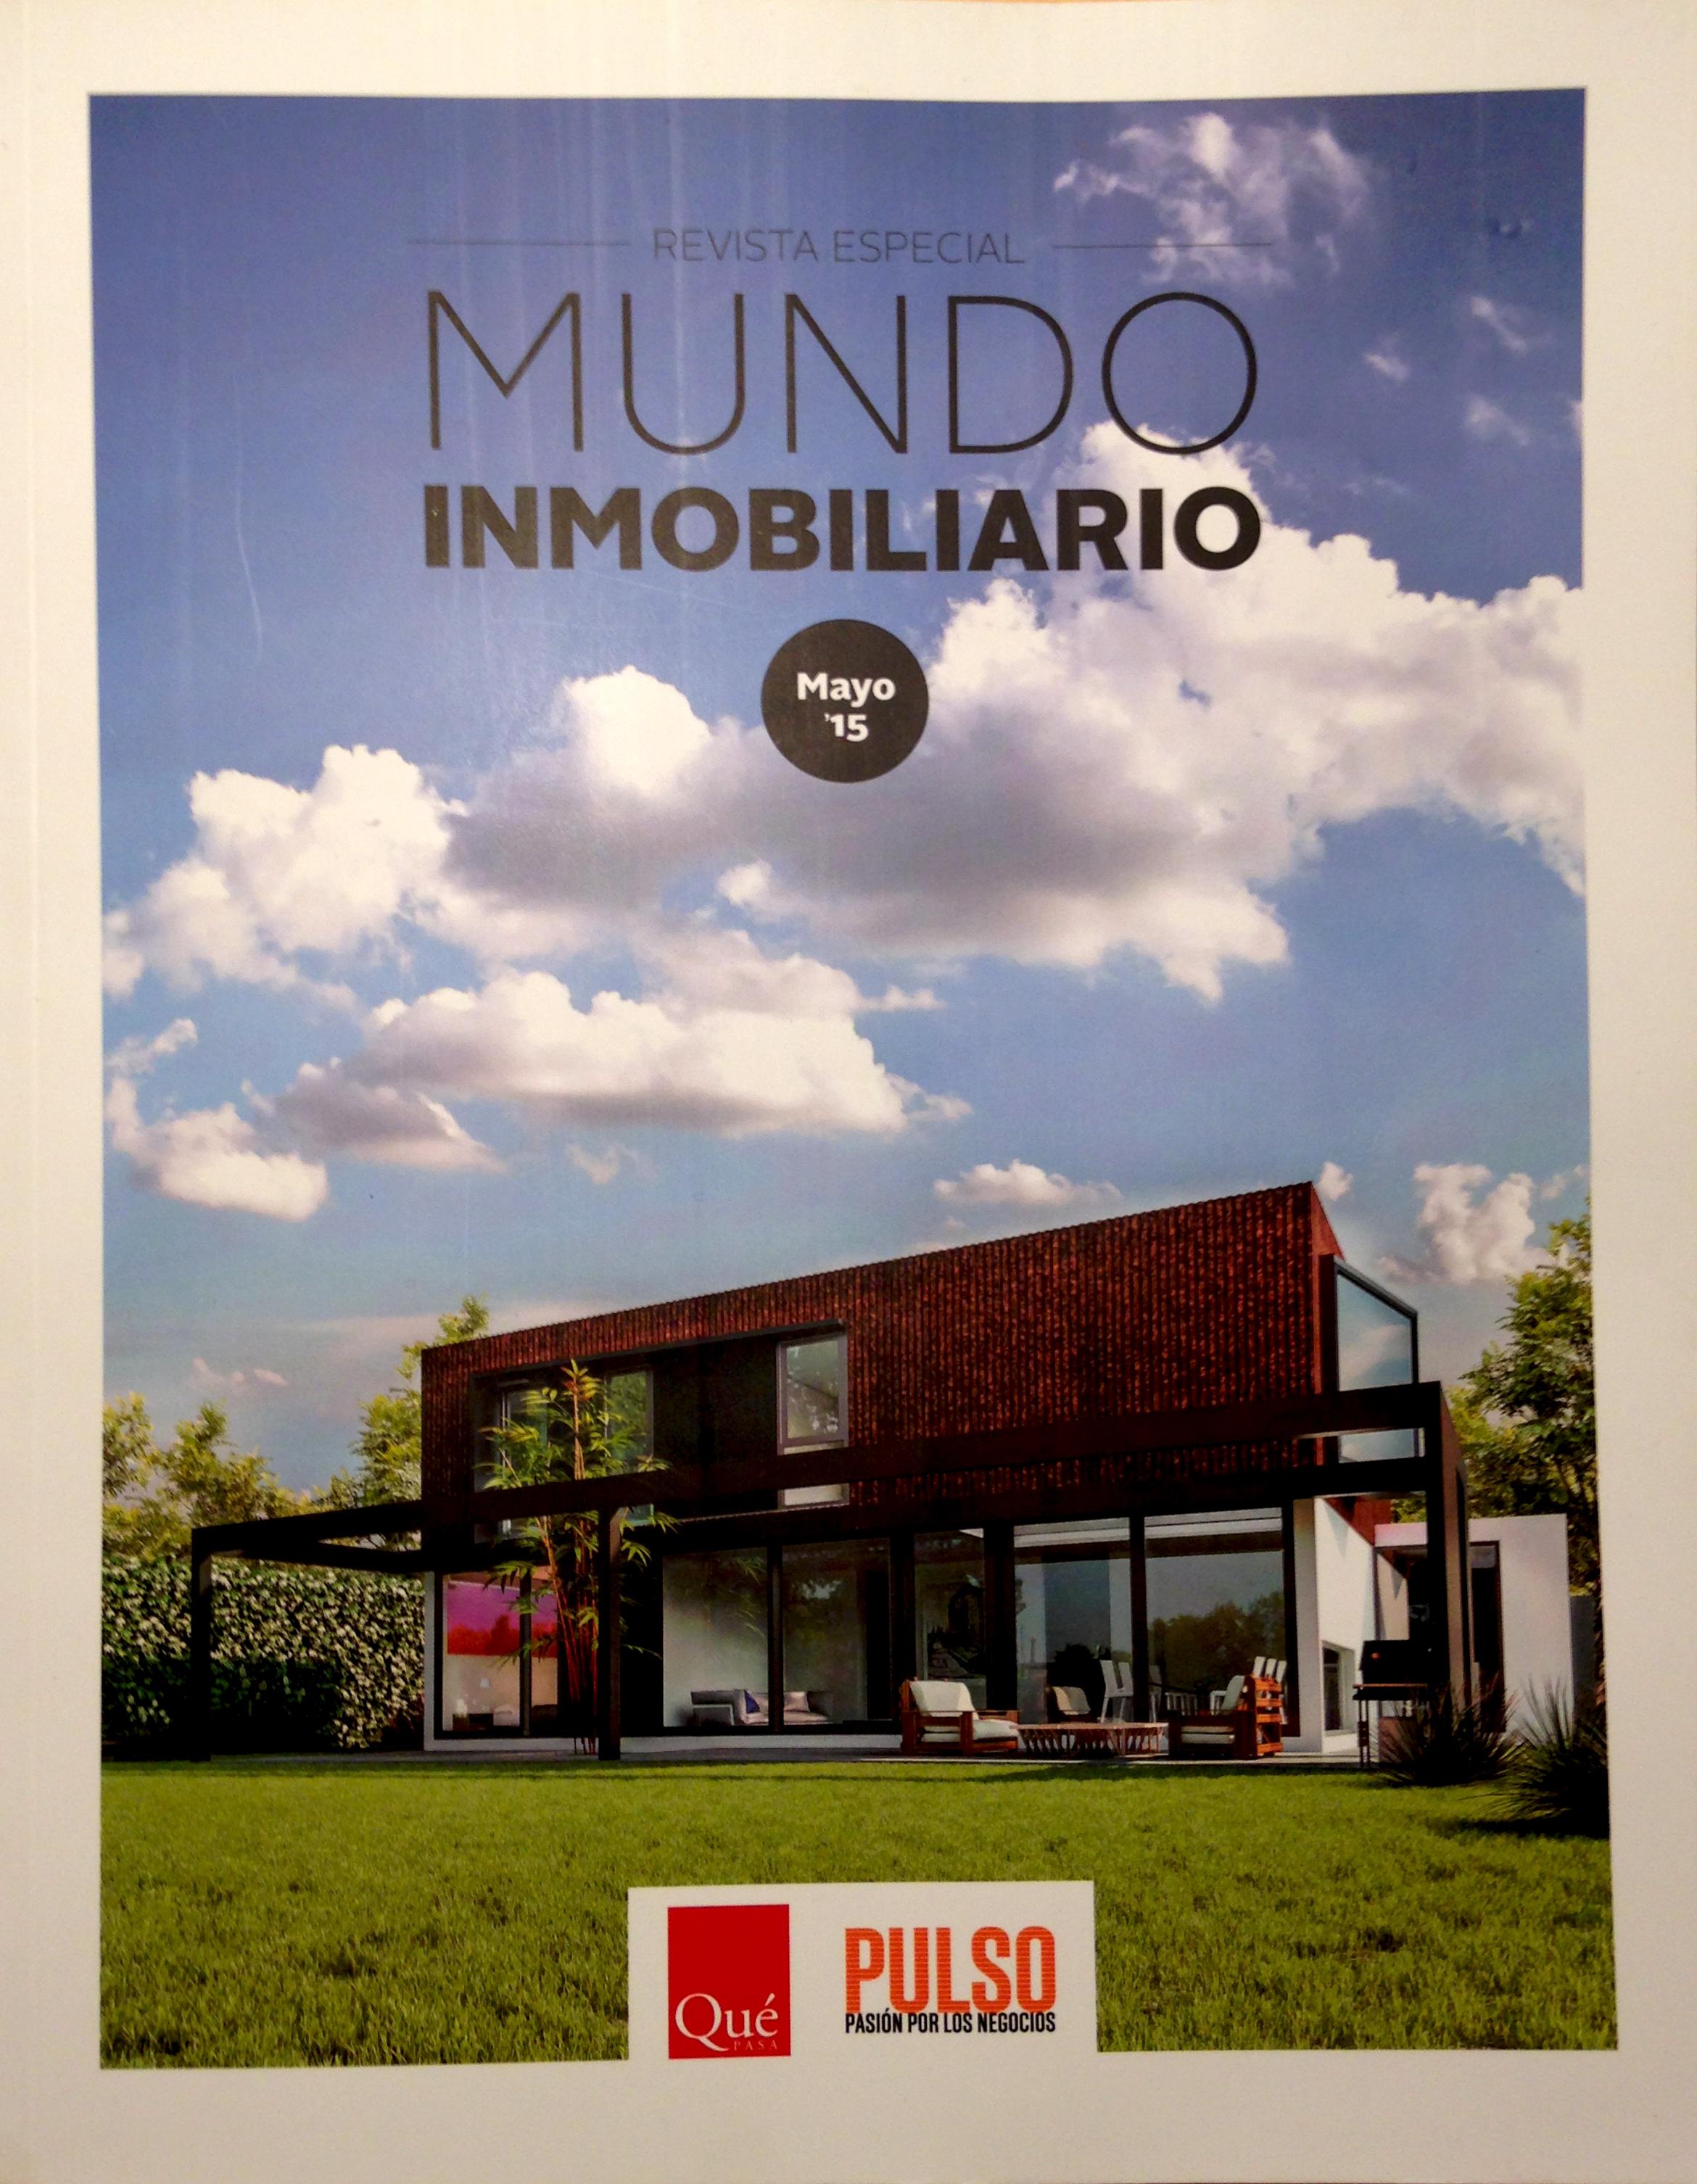 2015 MAY - QUE PASA - MUNO INMOBILIARIO.jpg